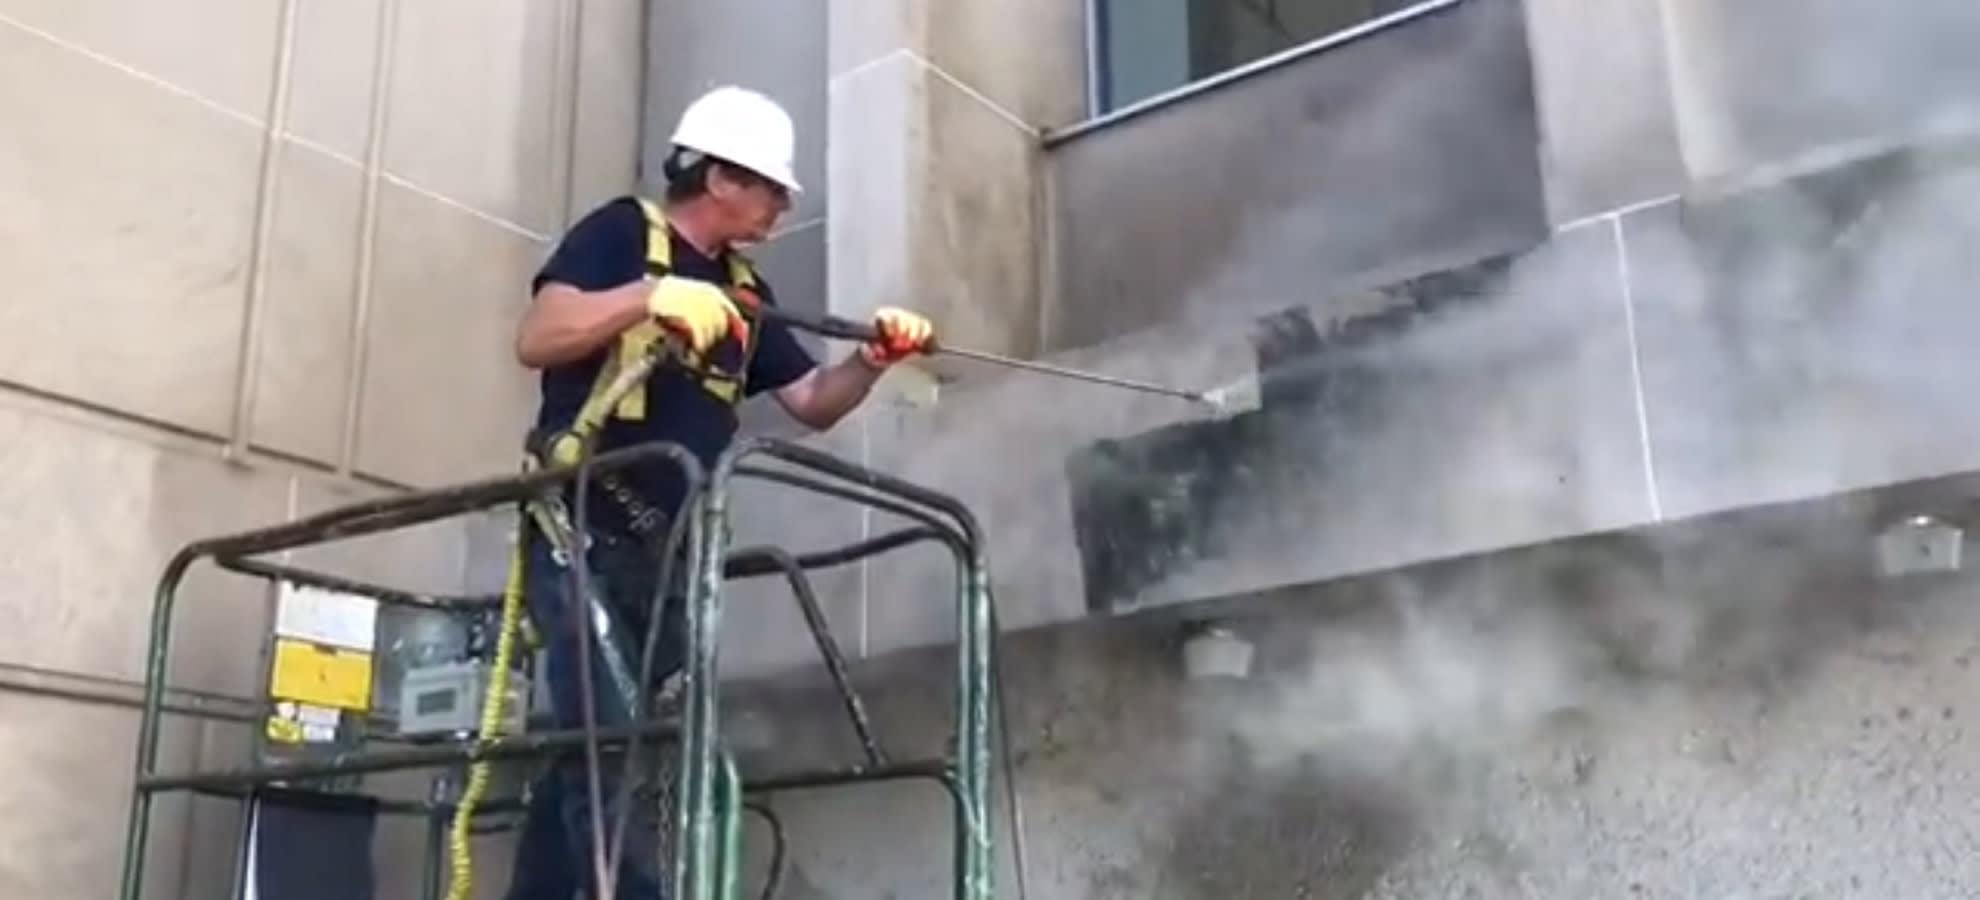 SteamBlast - Lavagem a Vapor Super Aquecido image